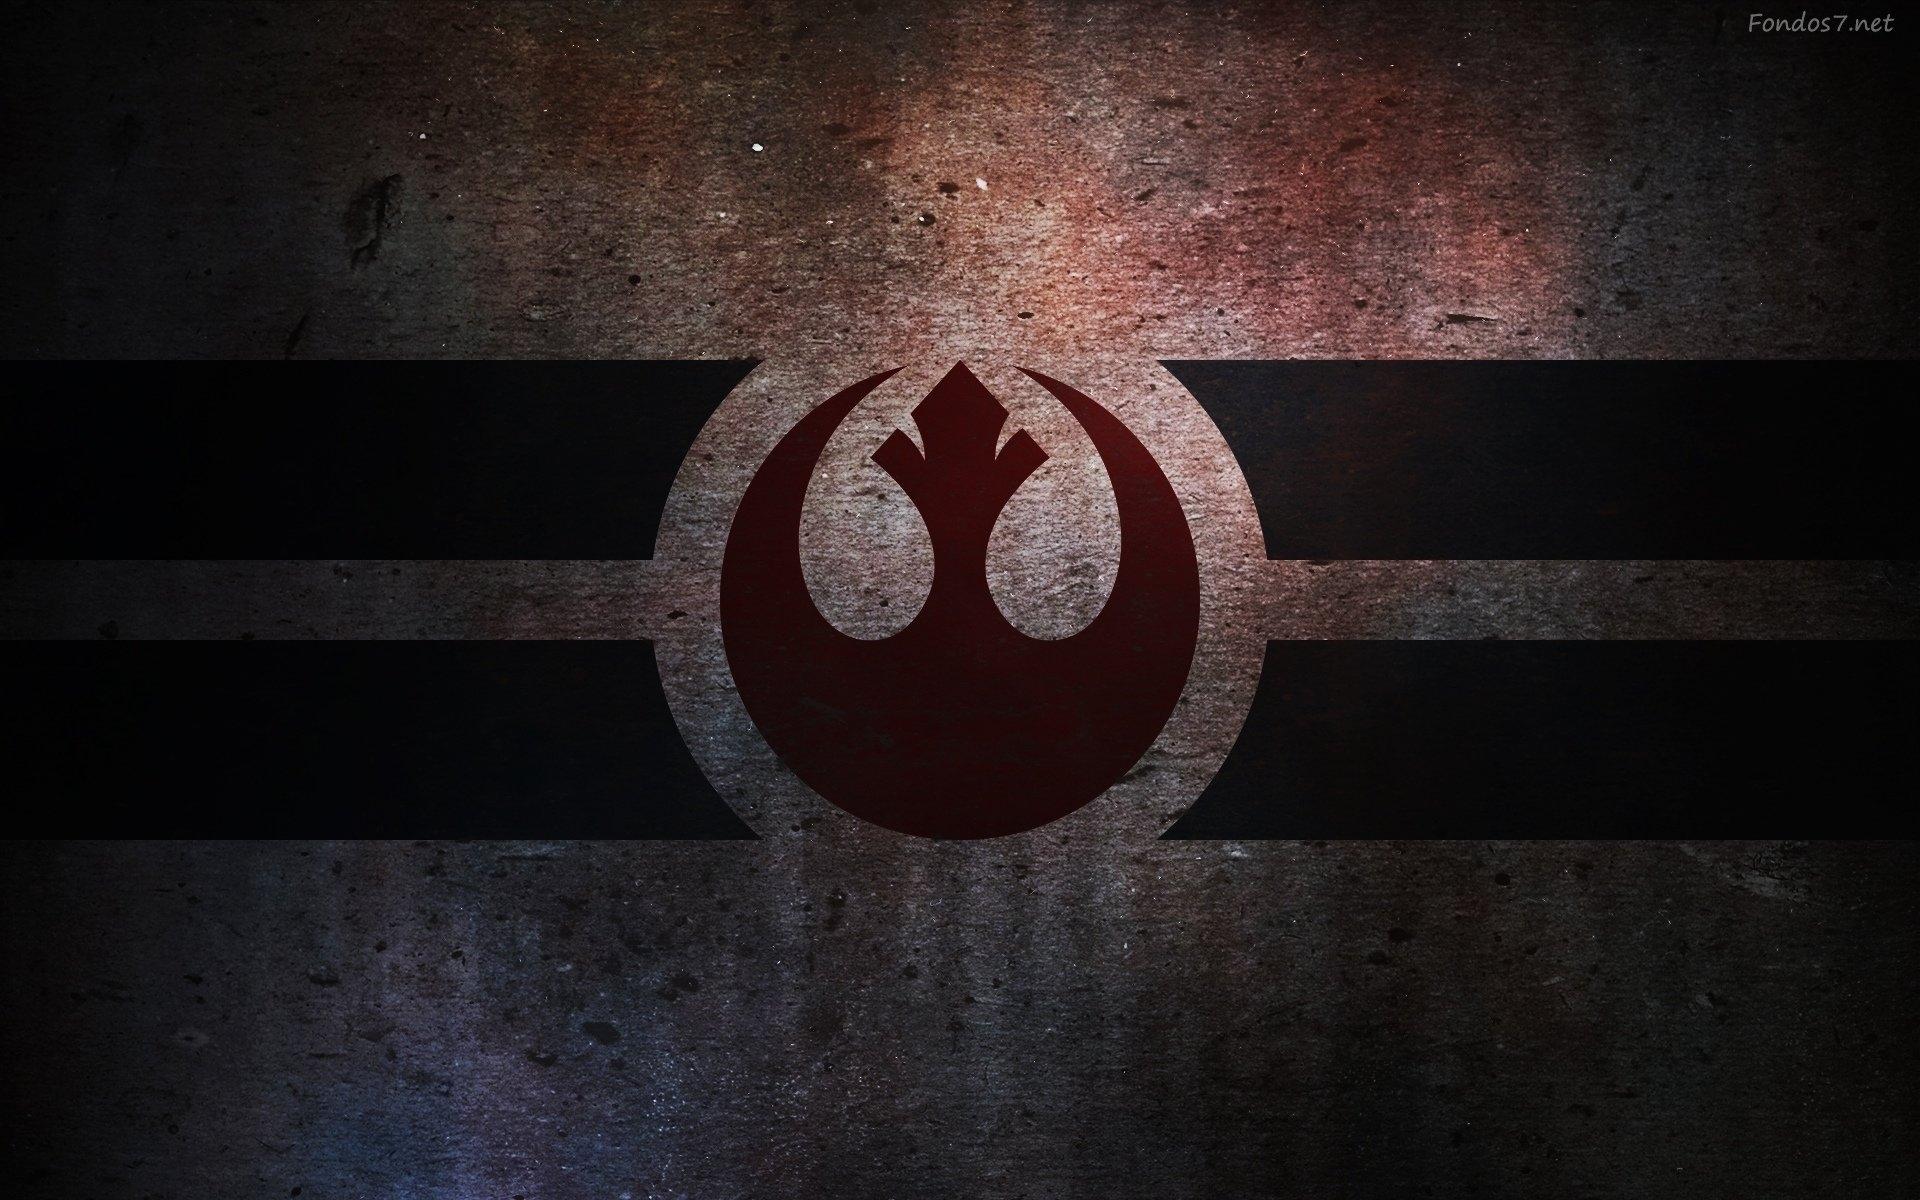 star wars rebel logo - walldevil